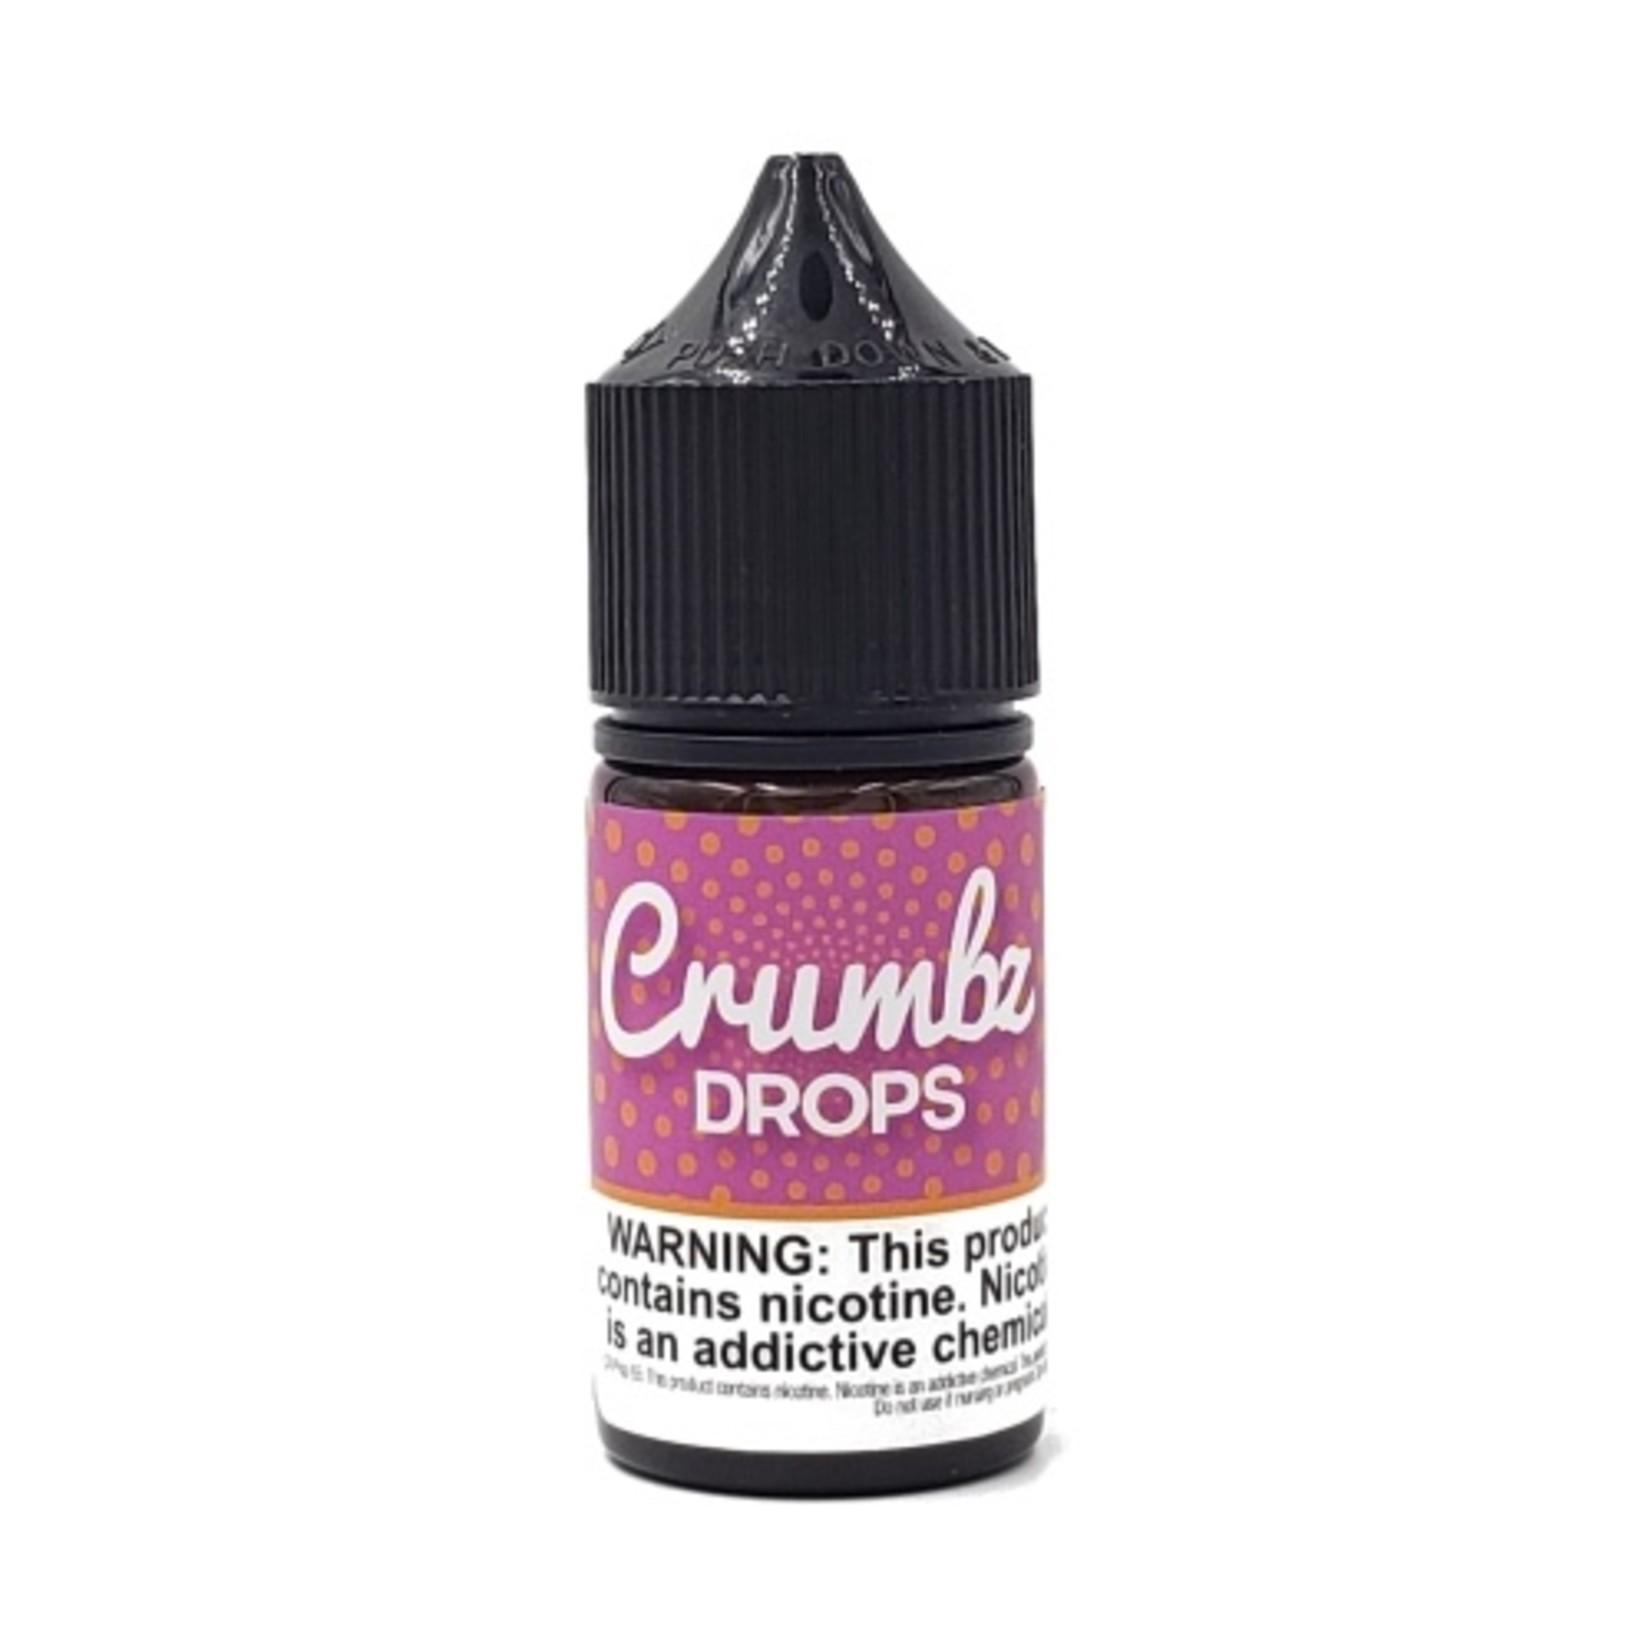 Crumbz Drops Flakey French Nic Salt